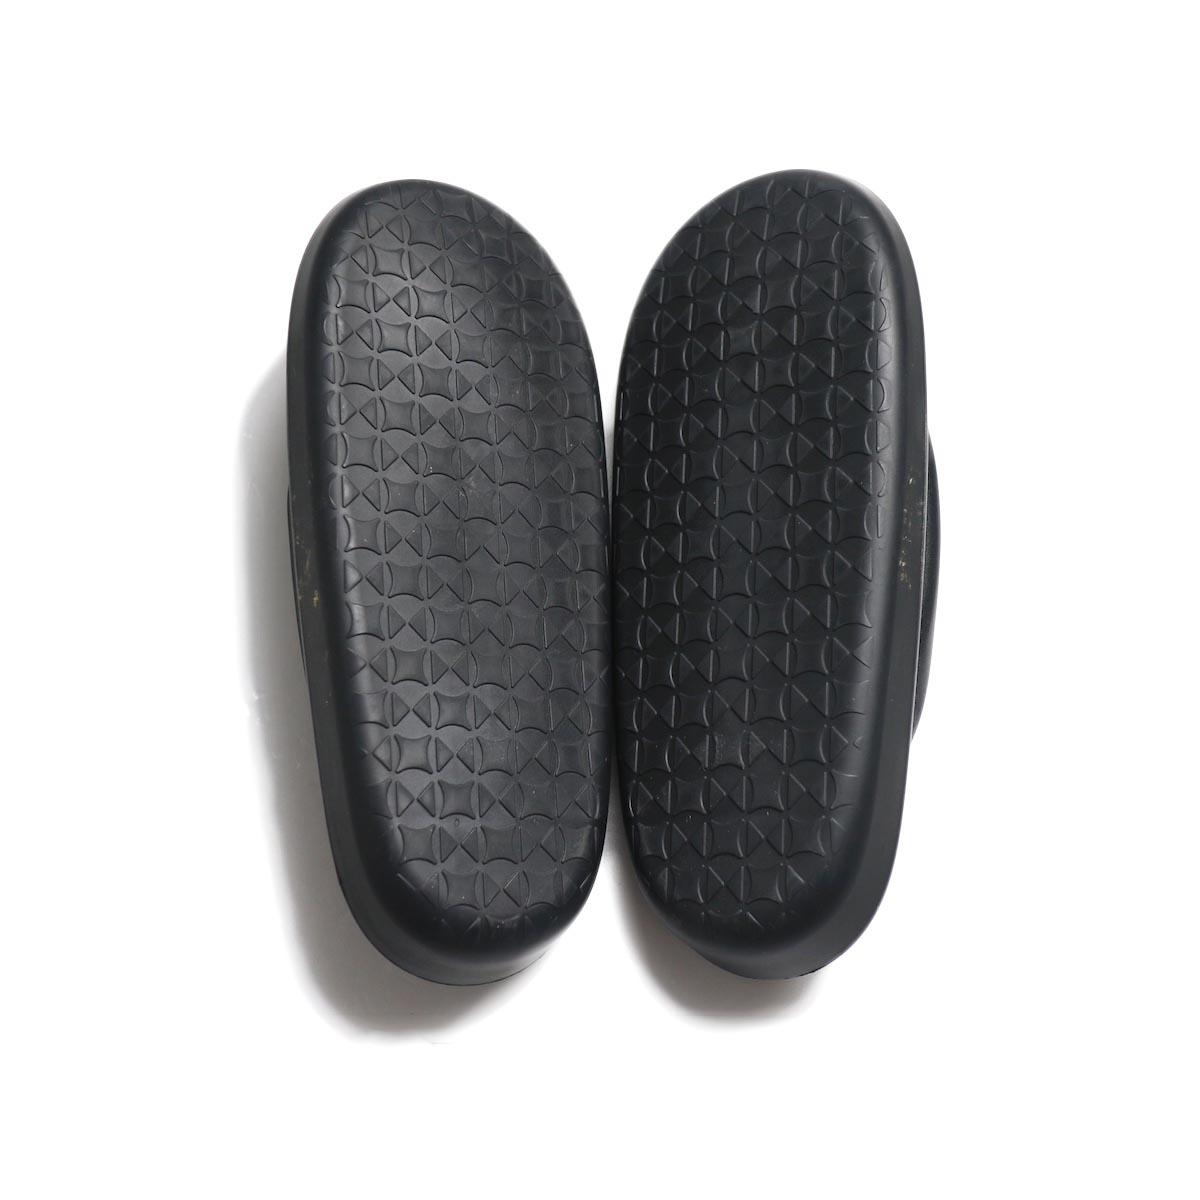 JOJO / SANDAL -Black (Black Suede) アウトソール